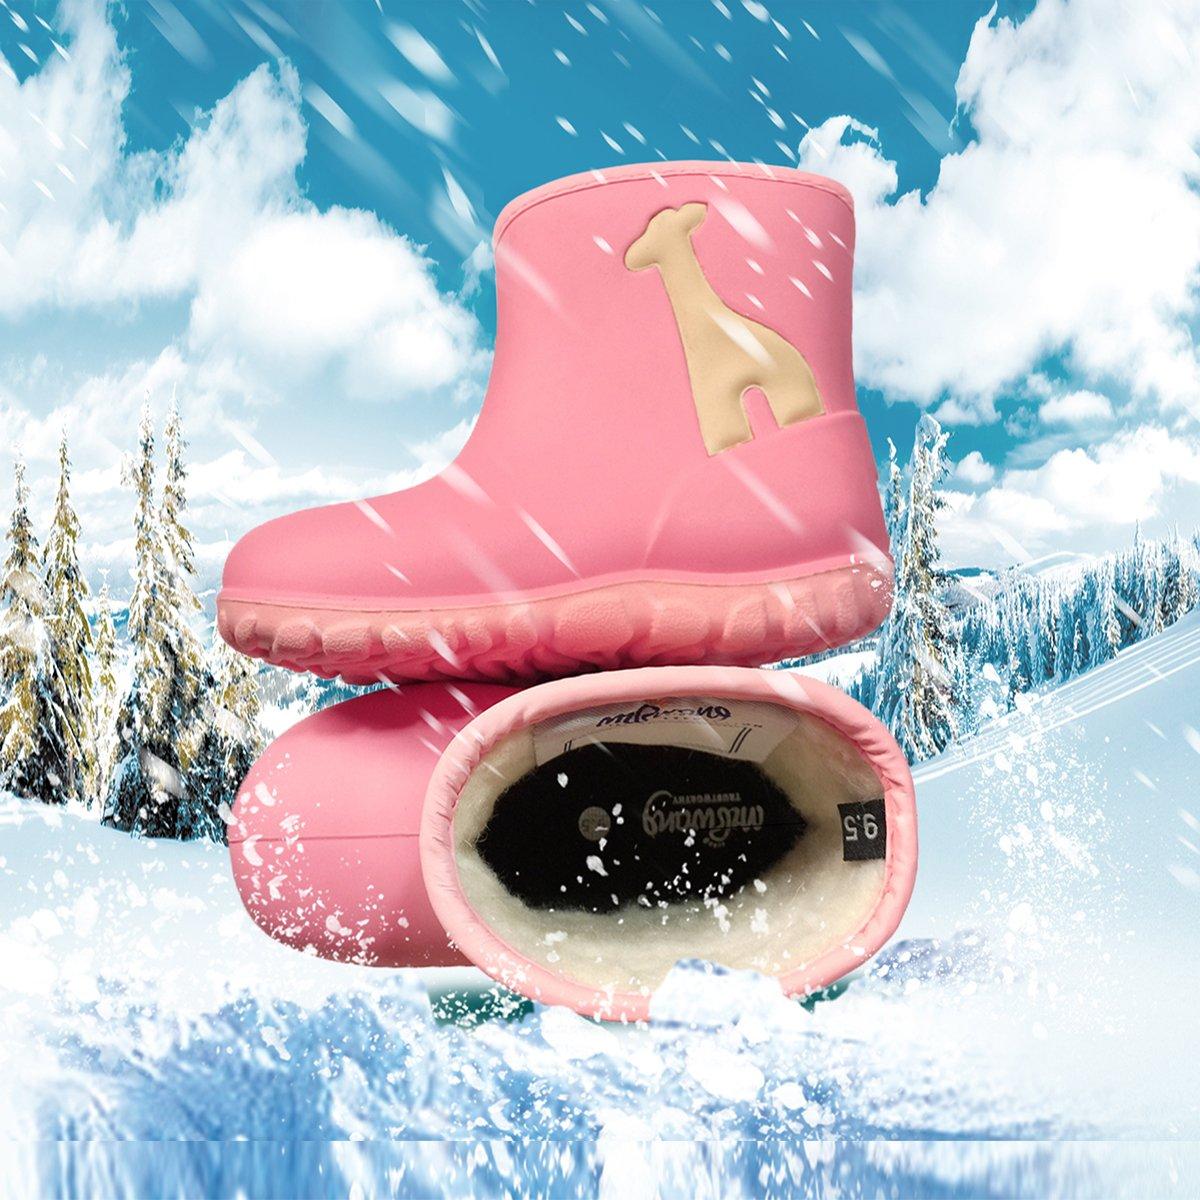 Black//Green//Pink MZKWANG Snow Boots Winter Outdoor Shoes PU Waterproof Boots Muck Rain Boots Rubber Overshoes Girl Boy Kids